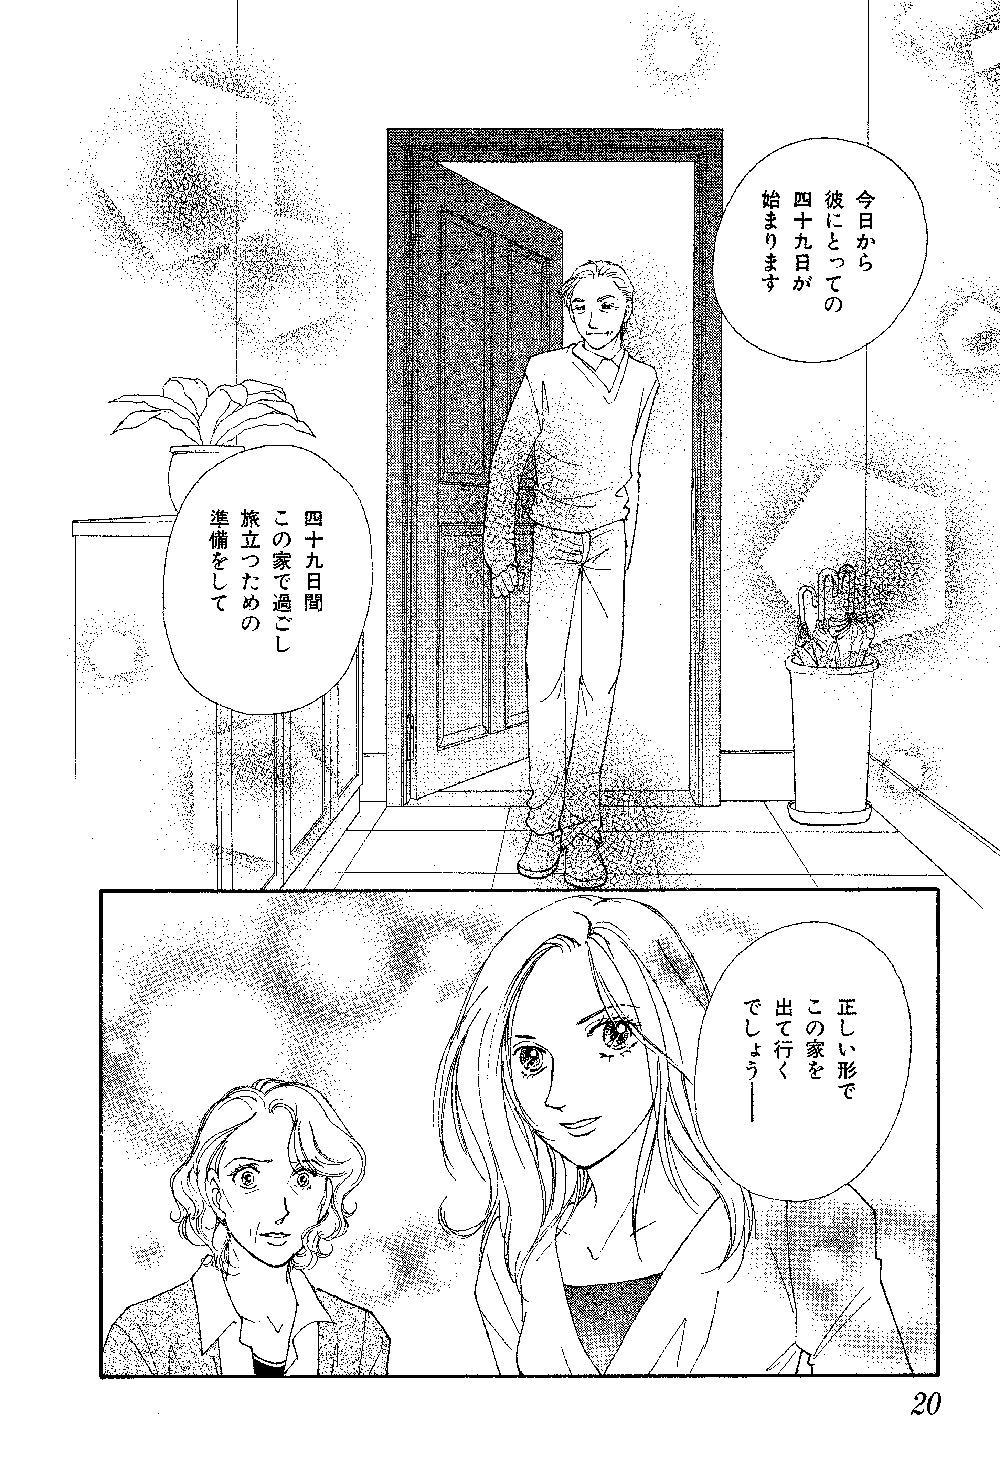 mayuri_0001_0020.jpg